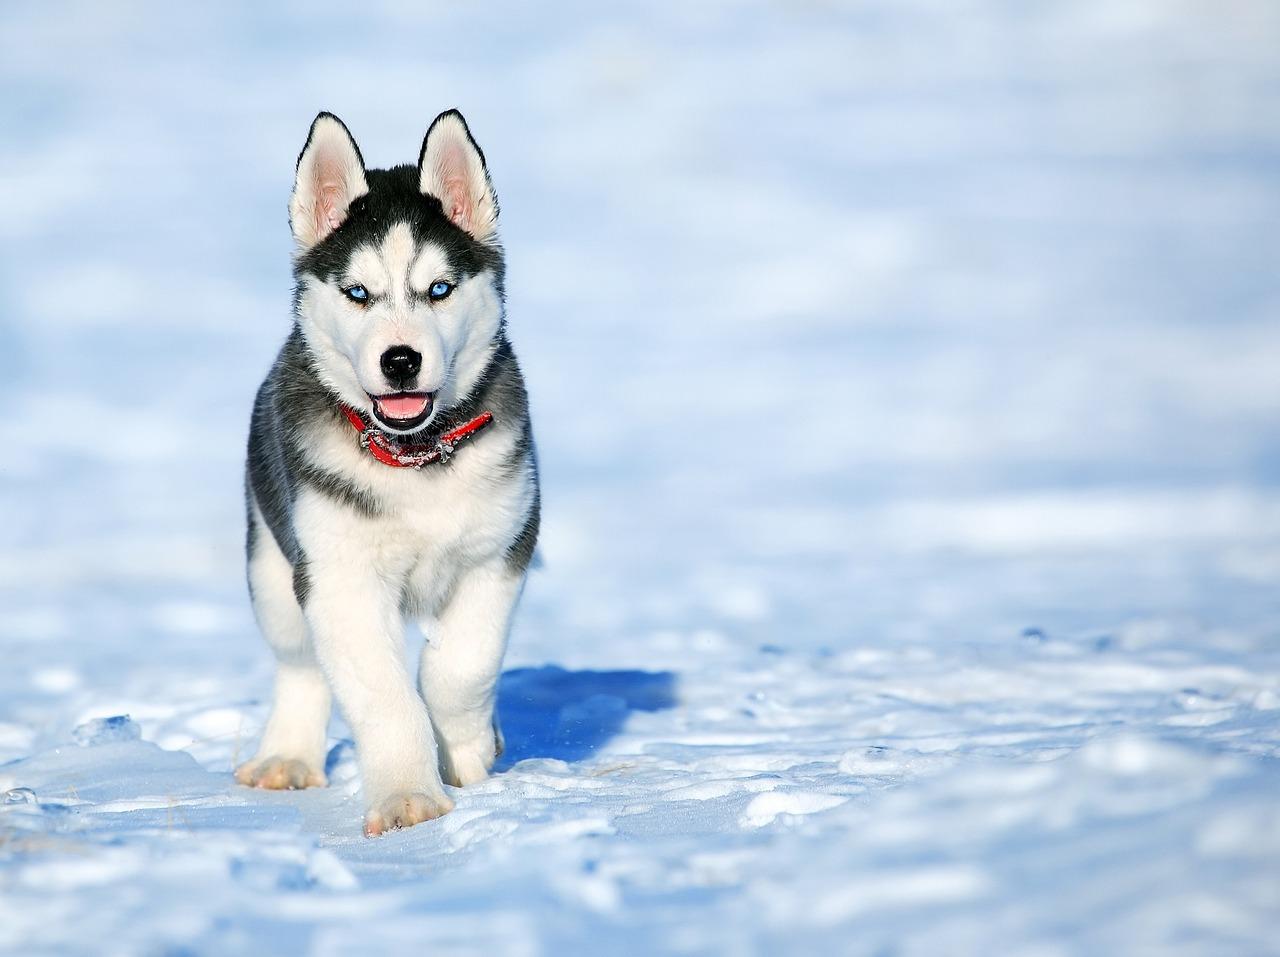 imágenes husky siberiano